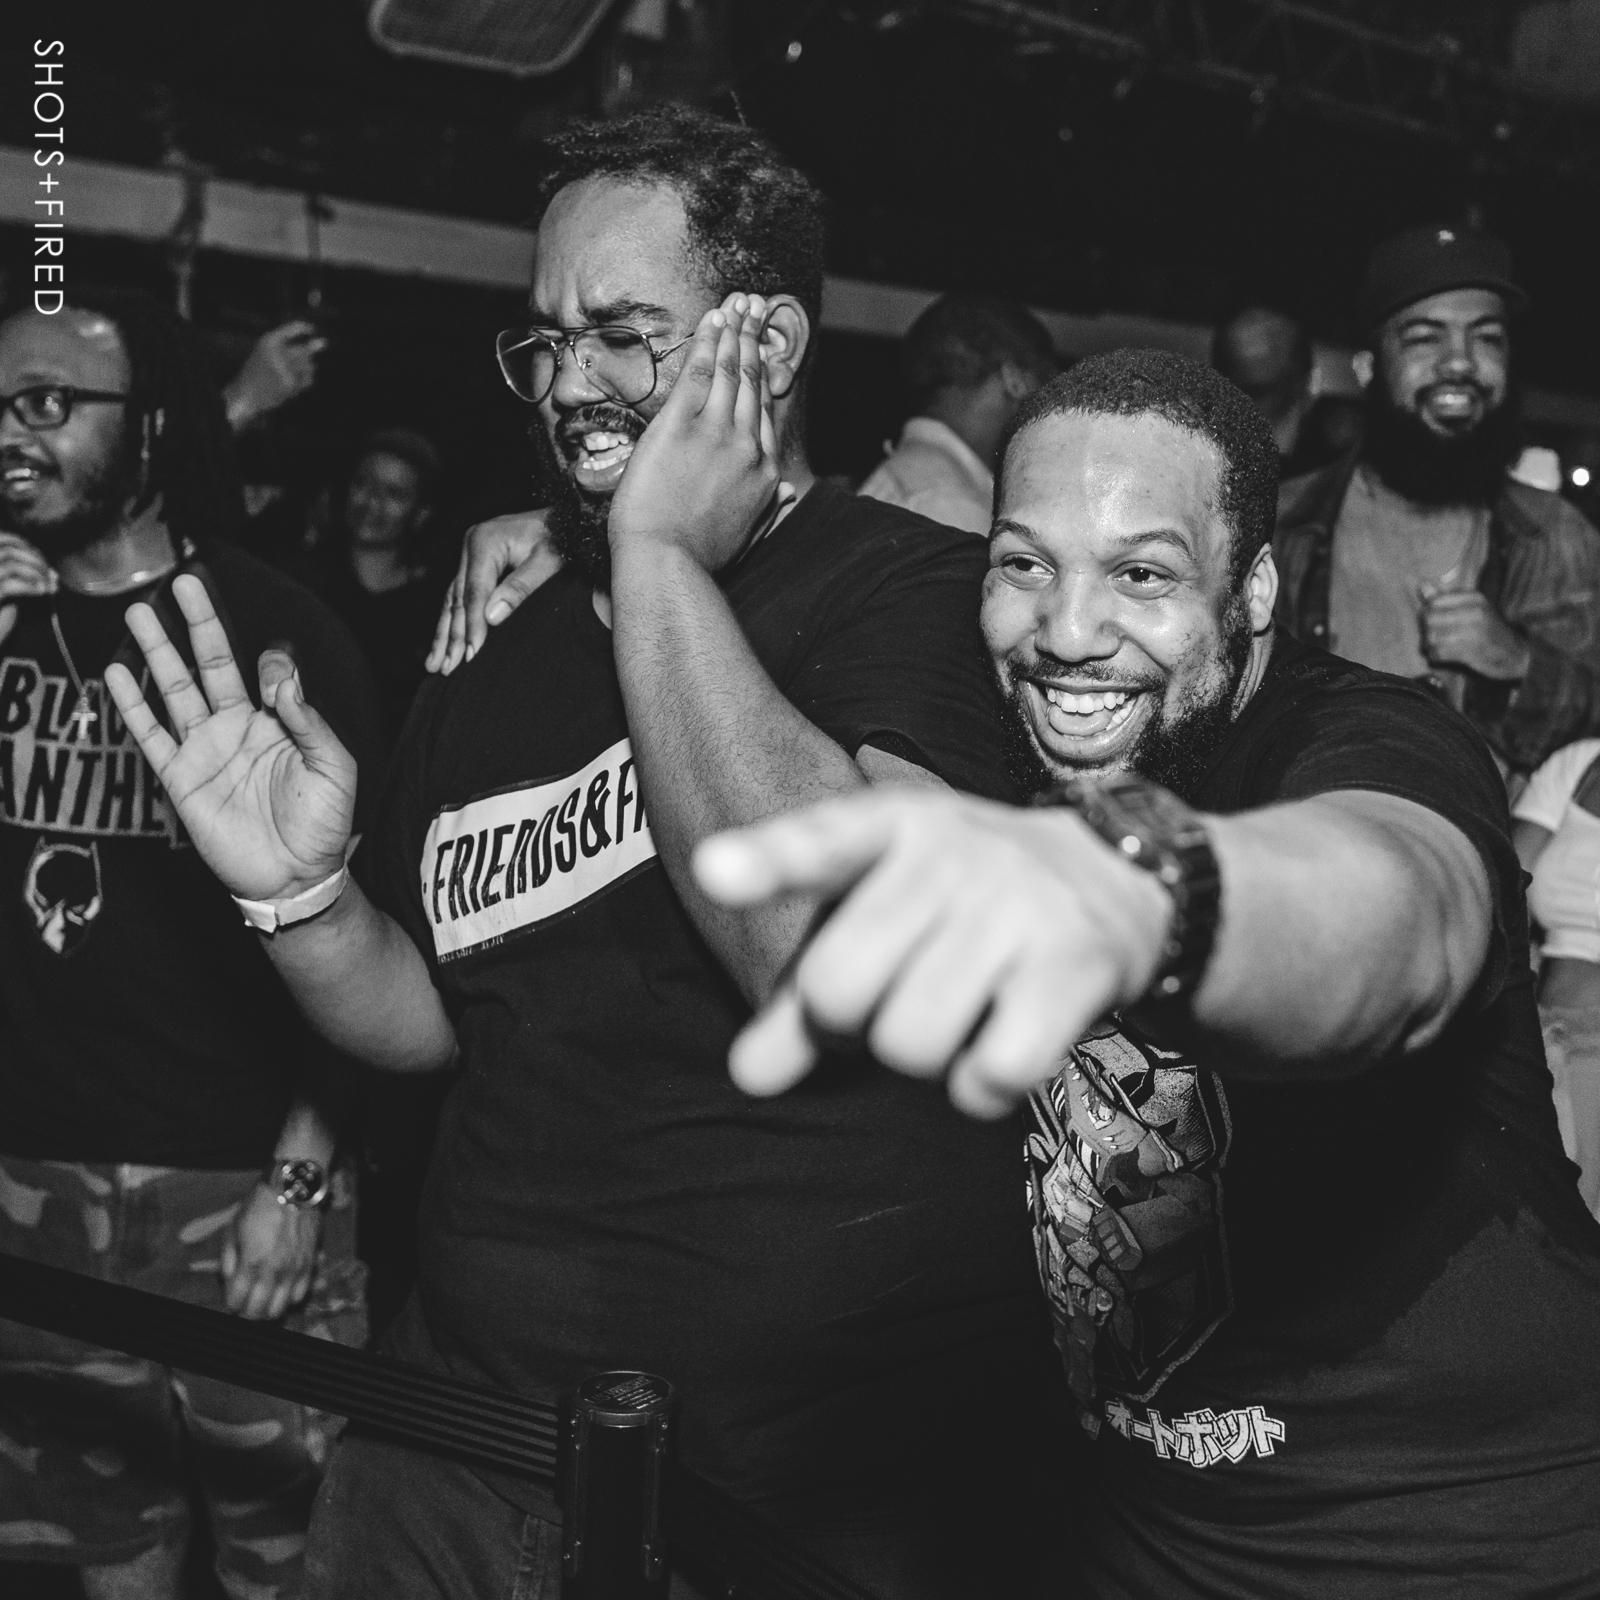 FRIENDS & FAM (PHL) W/ MATTHEW LAW Feat. THE WHOOLIGAN @ WAREHOUSE ON WATTS (Sept 2018) // Presented By Matthew Law